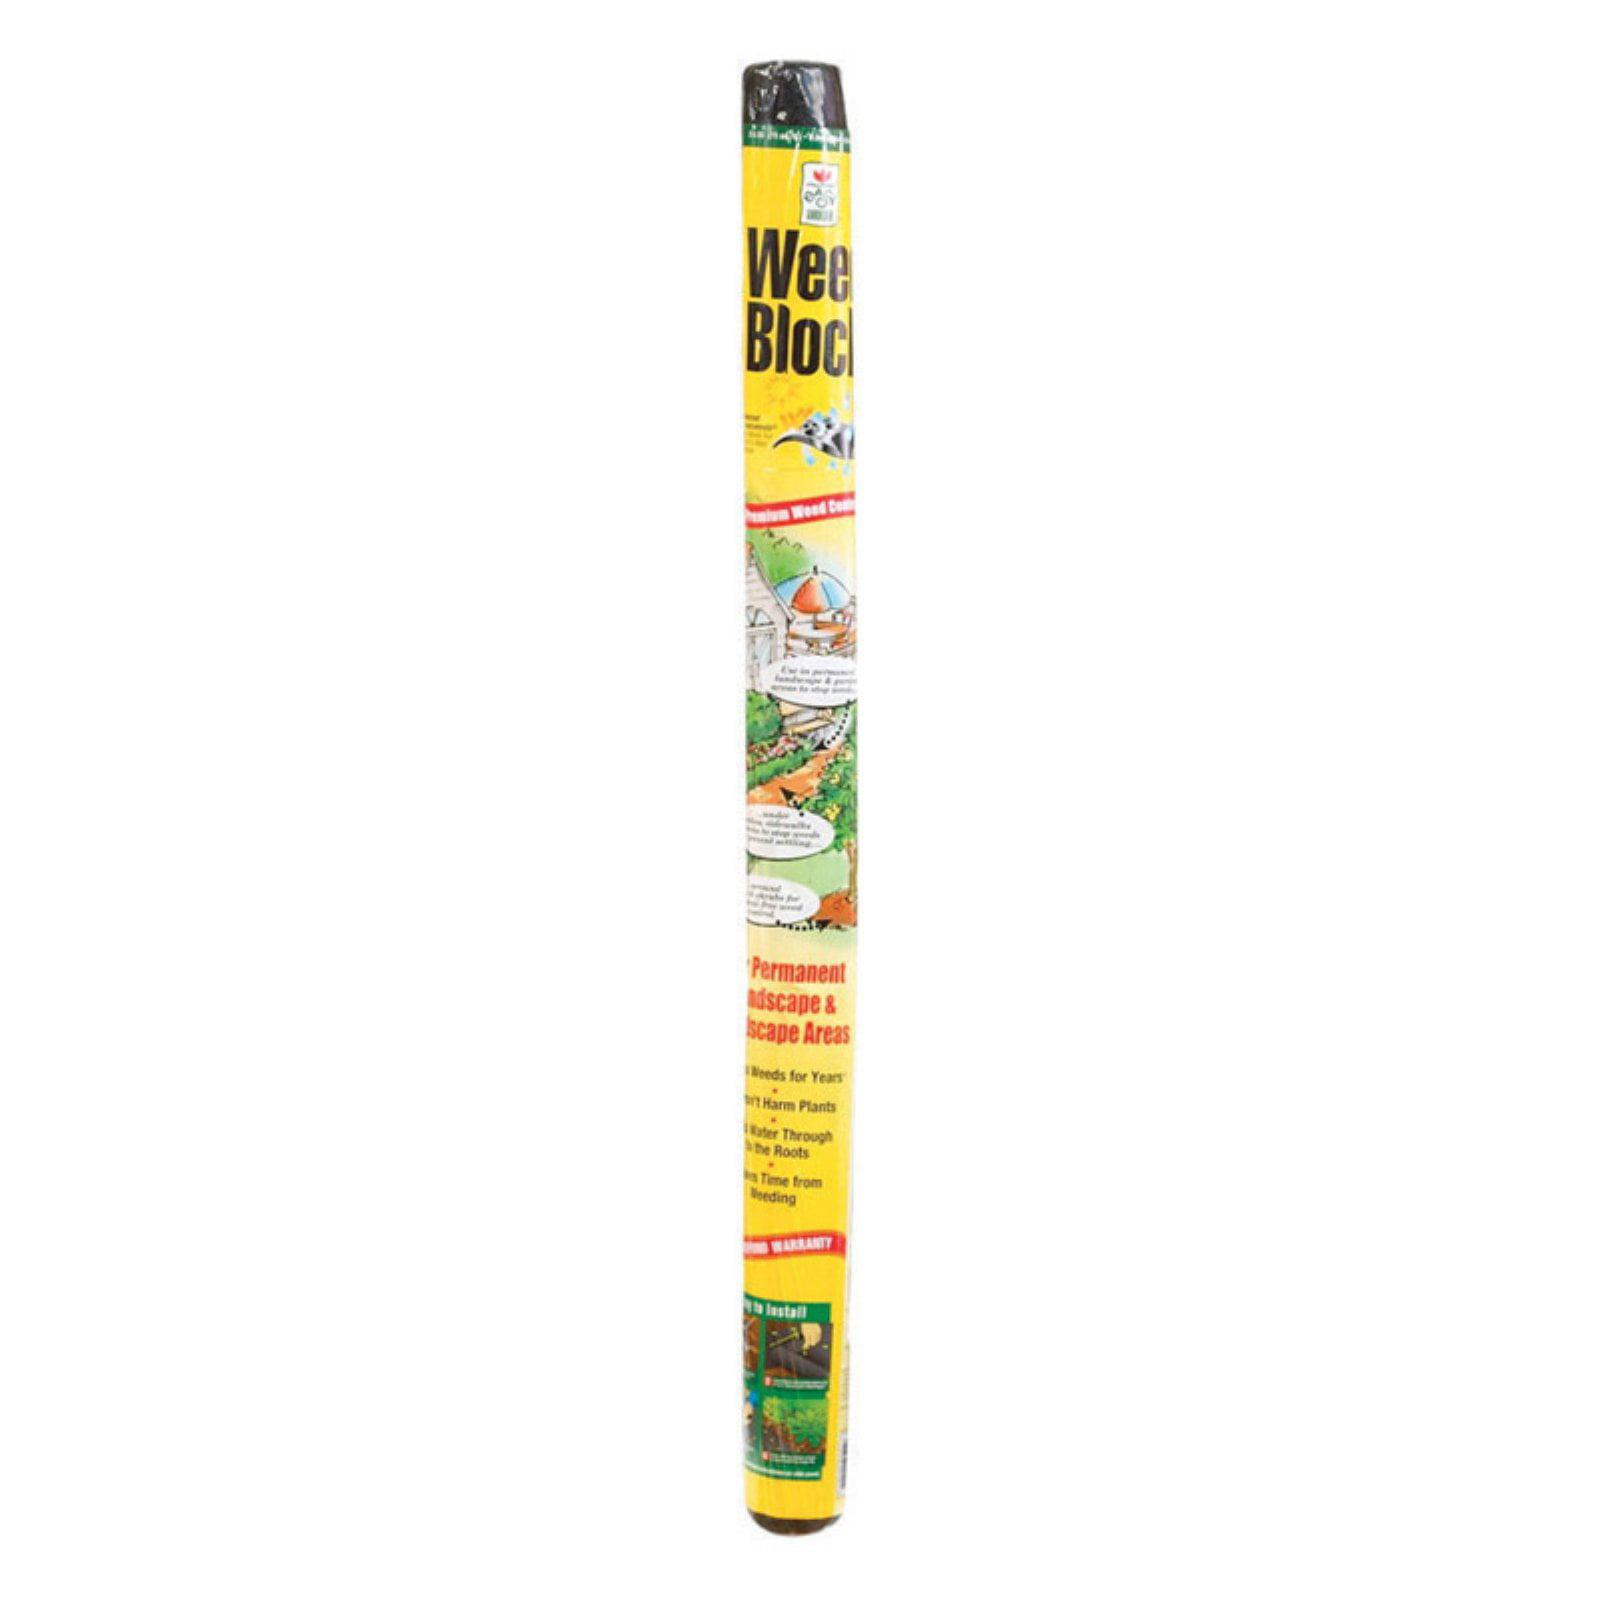 Easy Gardener 1001 3' x 25' Weedblock Landscape Fabric